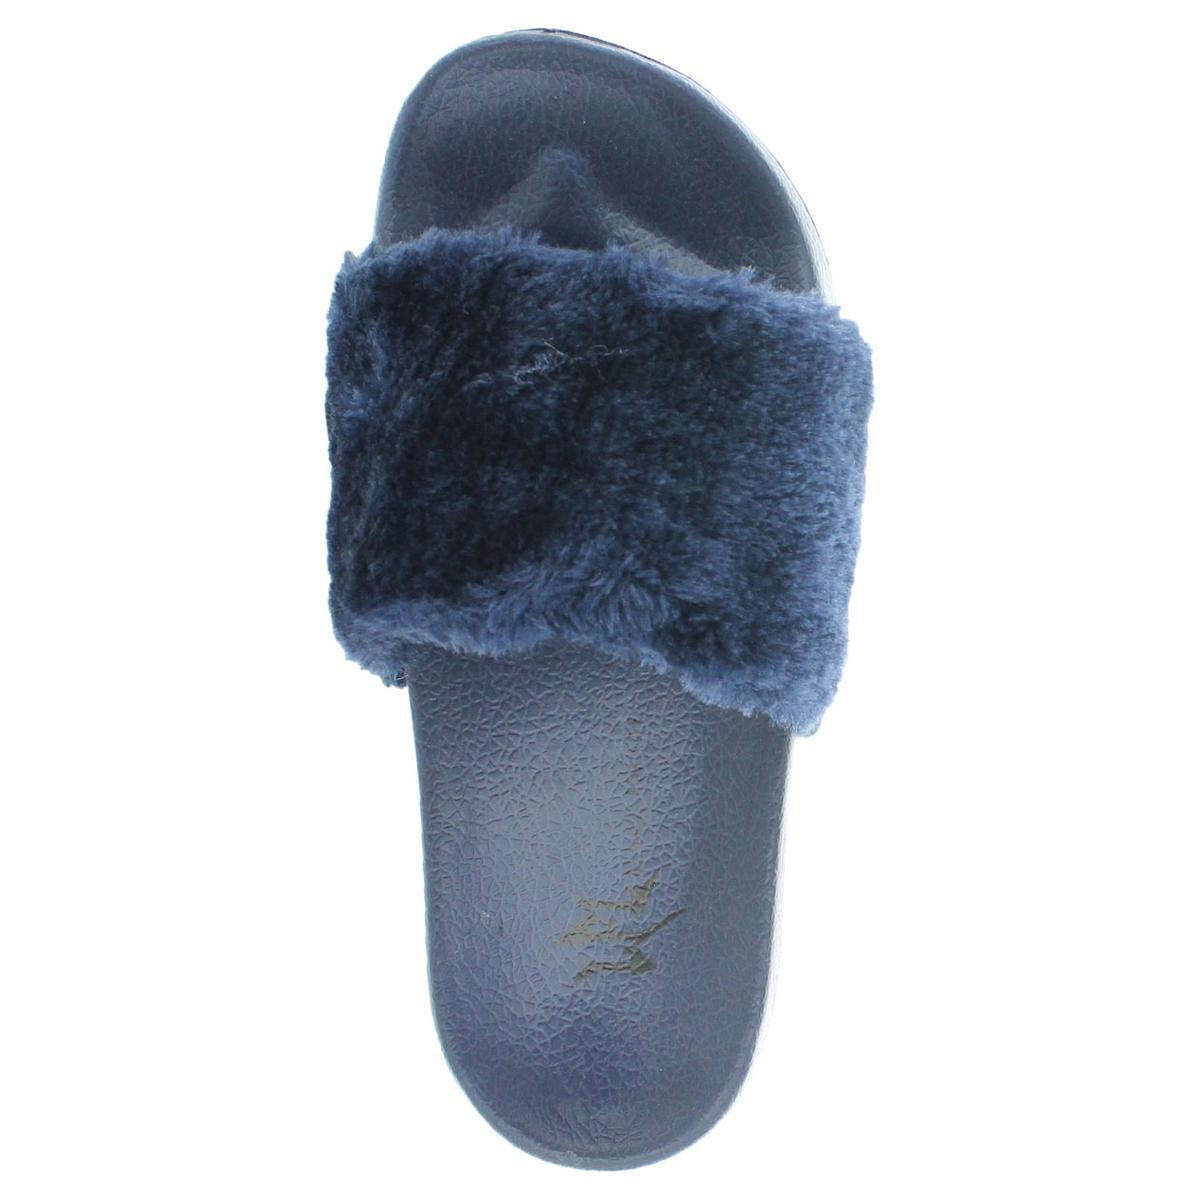 e155b0ff7dc1a3 LFL by Lust for Life Women s Faux Fur Pool Slide Sandals